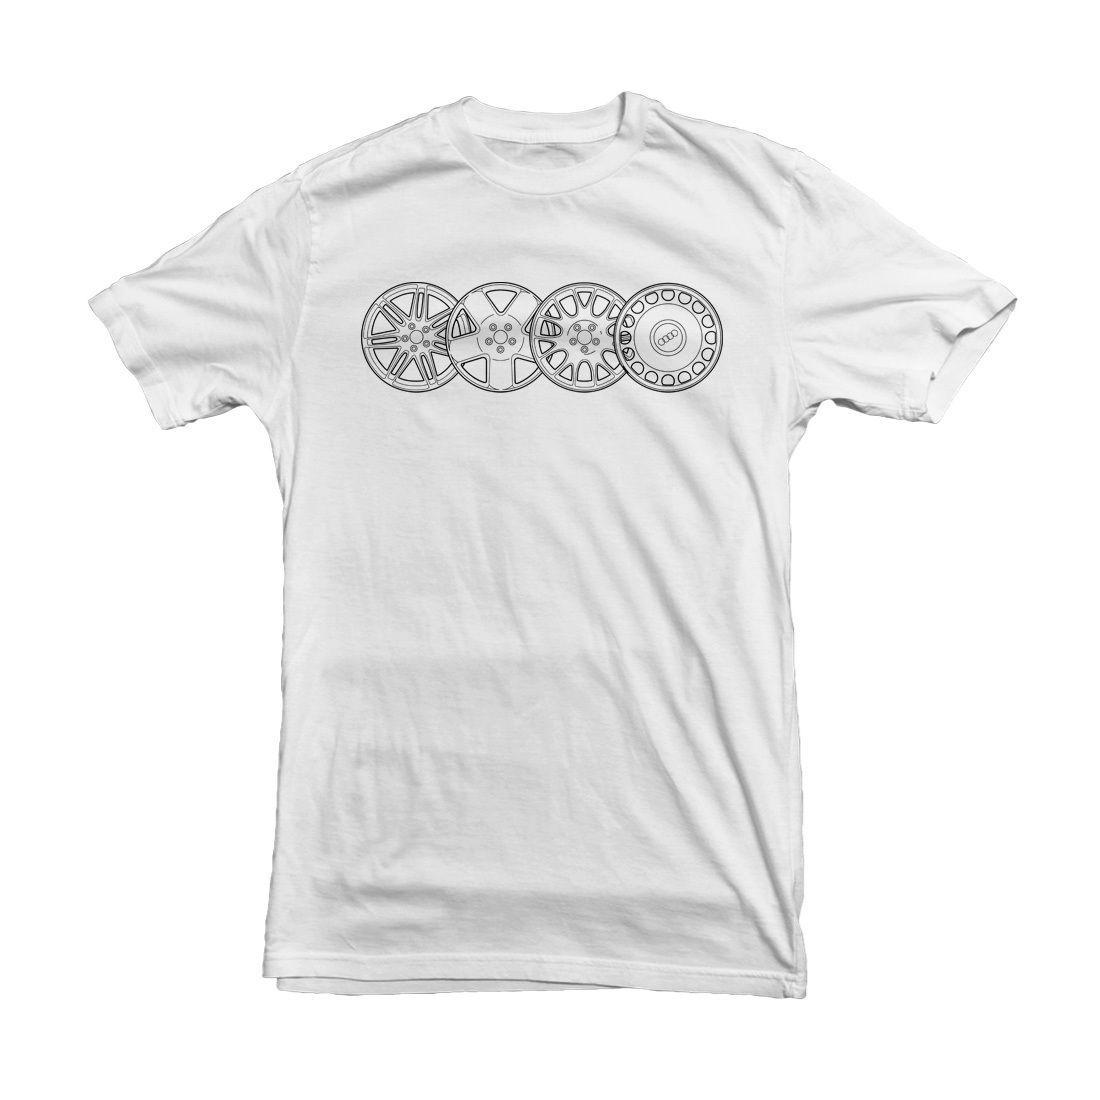 00bcee202 Men O Neck High Quality Hot Sell Alloy Wheels Men'S Car T Shirt White S M L  XL XXL Random T Shirts Poker T Shirts From Onecktshirt, $11.17| DHgate.Com